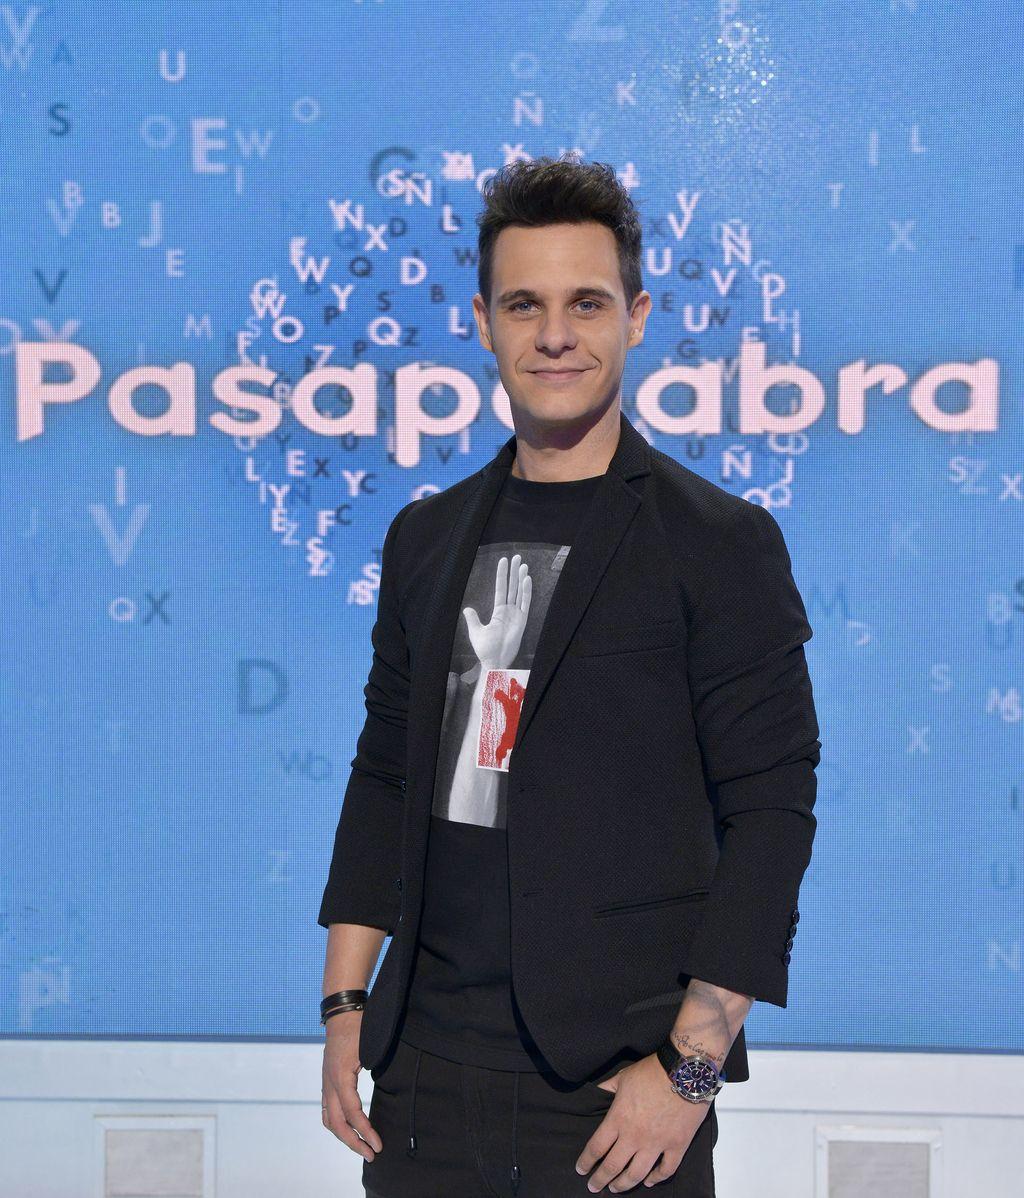 Christian Gálvez. Pasapalabra